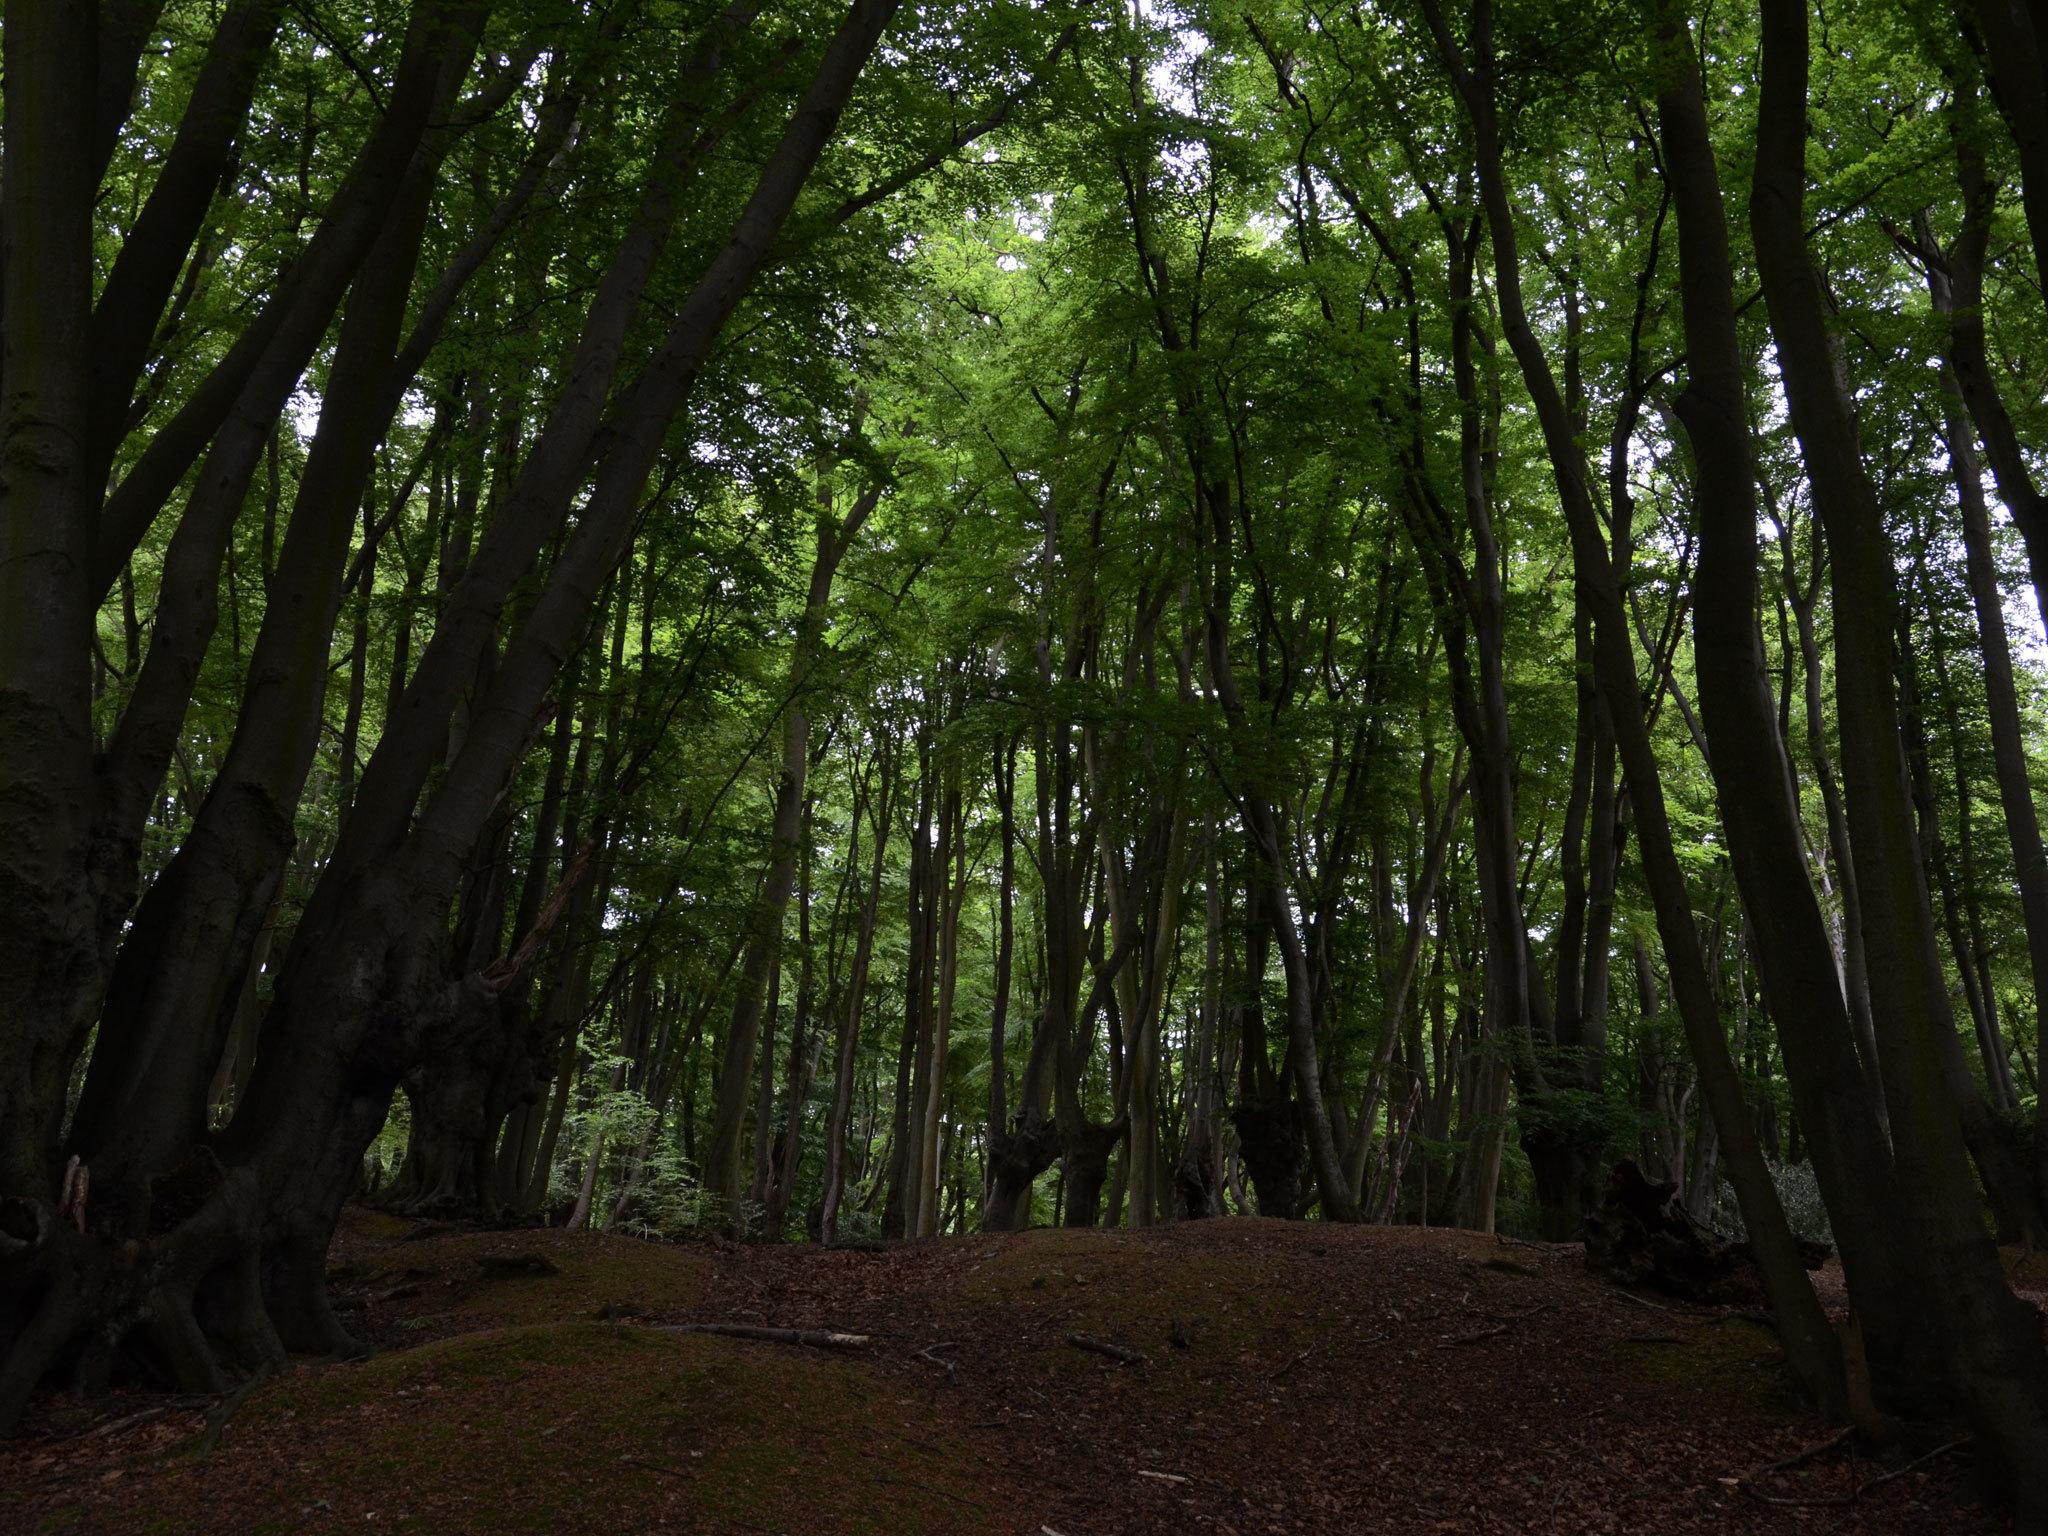 dead forest horror free как пройти место с шоссе